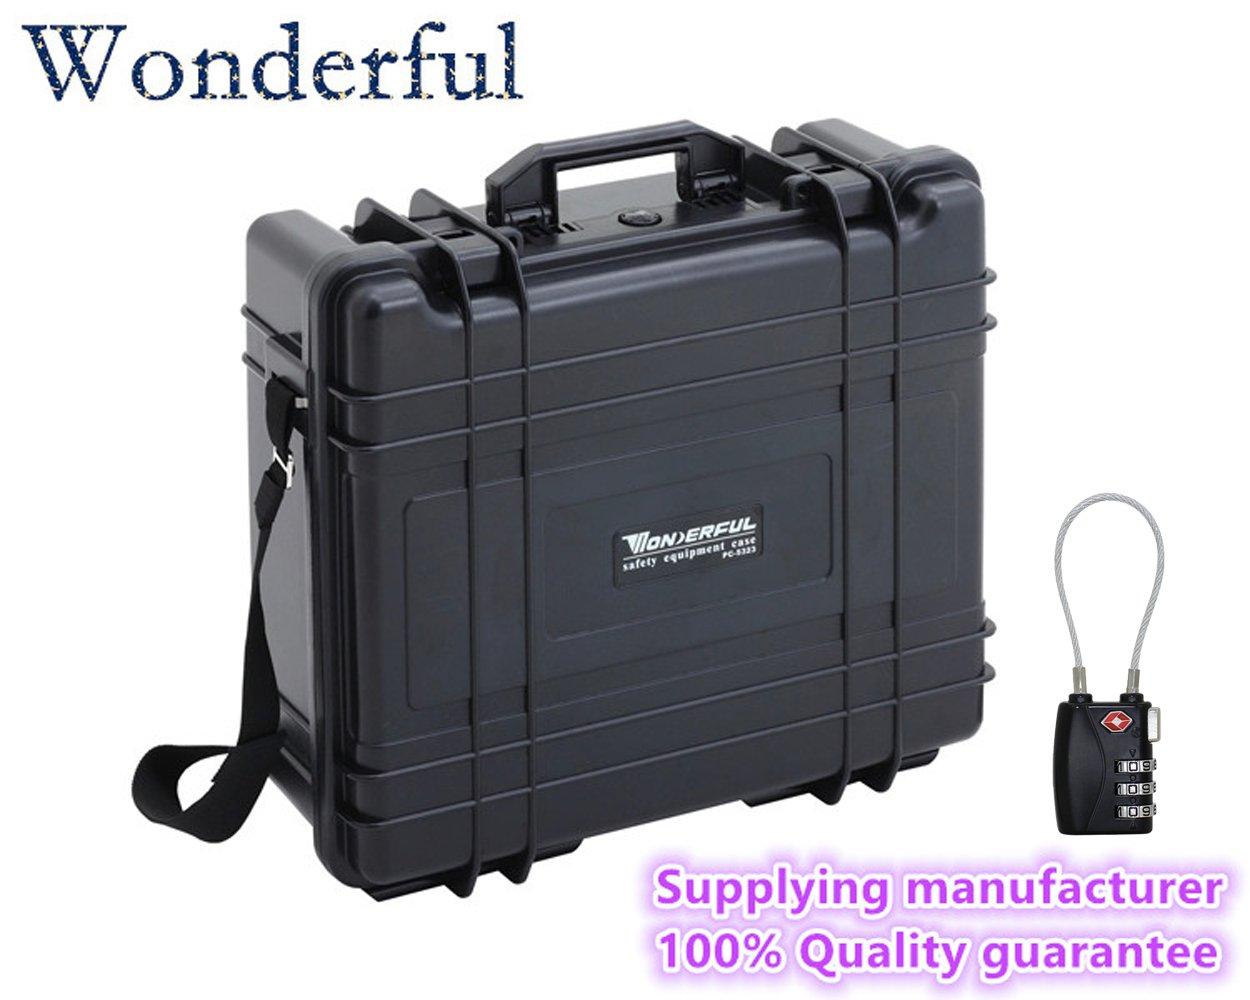 Wonderful pc-5323 Watertight Cases使用ABS素材、高強度と影響抵抗、絶対密封防水、防塵for yourカメラと機器Escort ブラック/ ArmyGreen    B01ELKYSO8